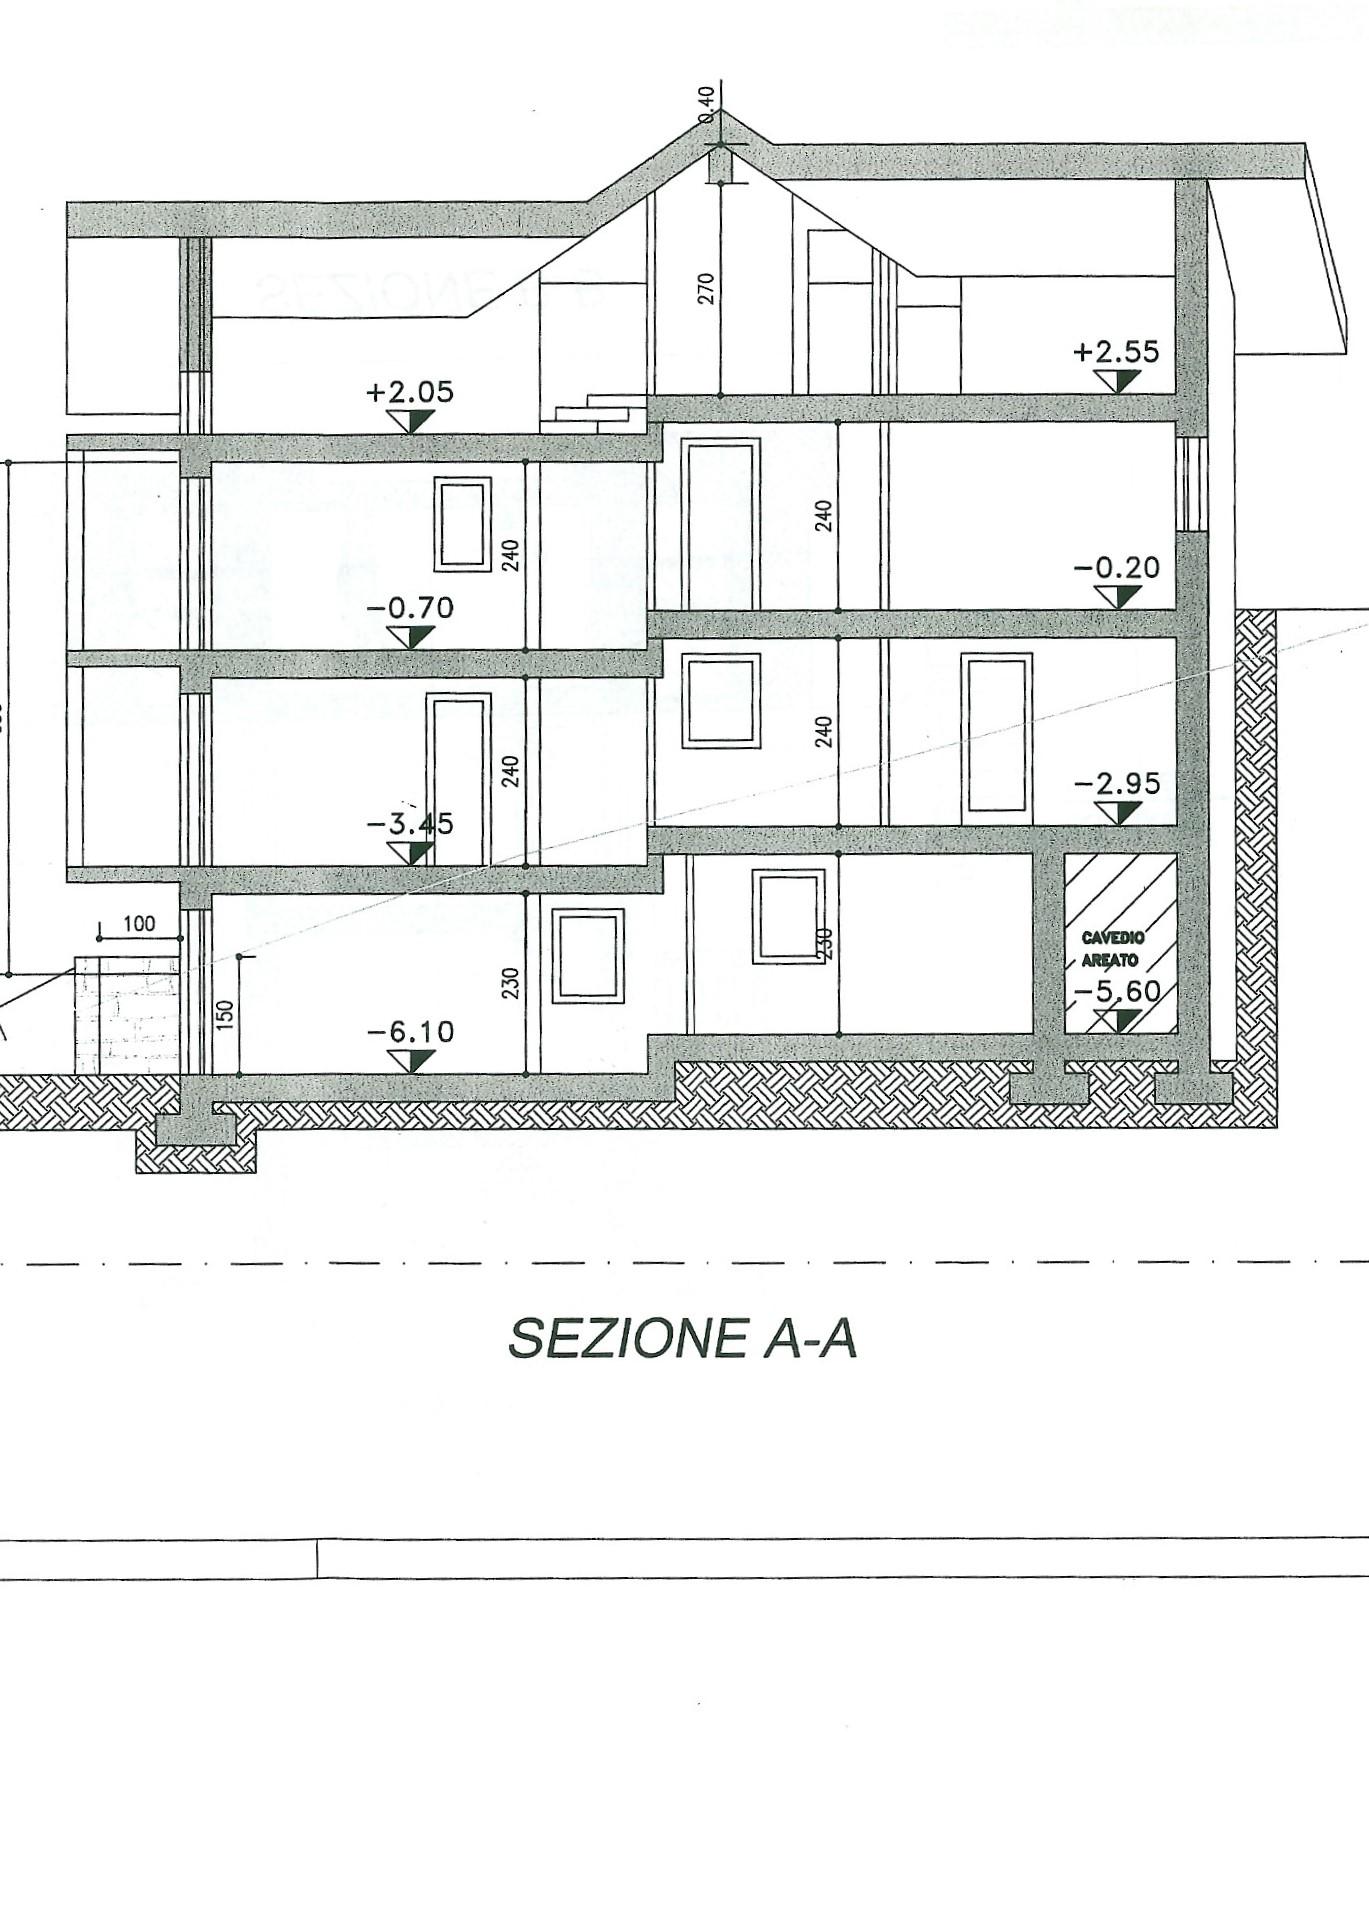 sezione a-a